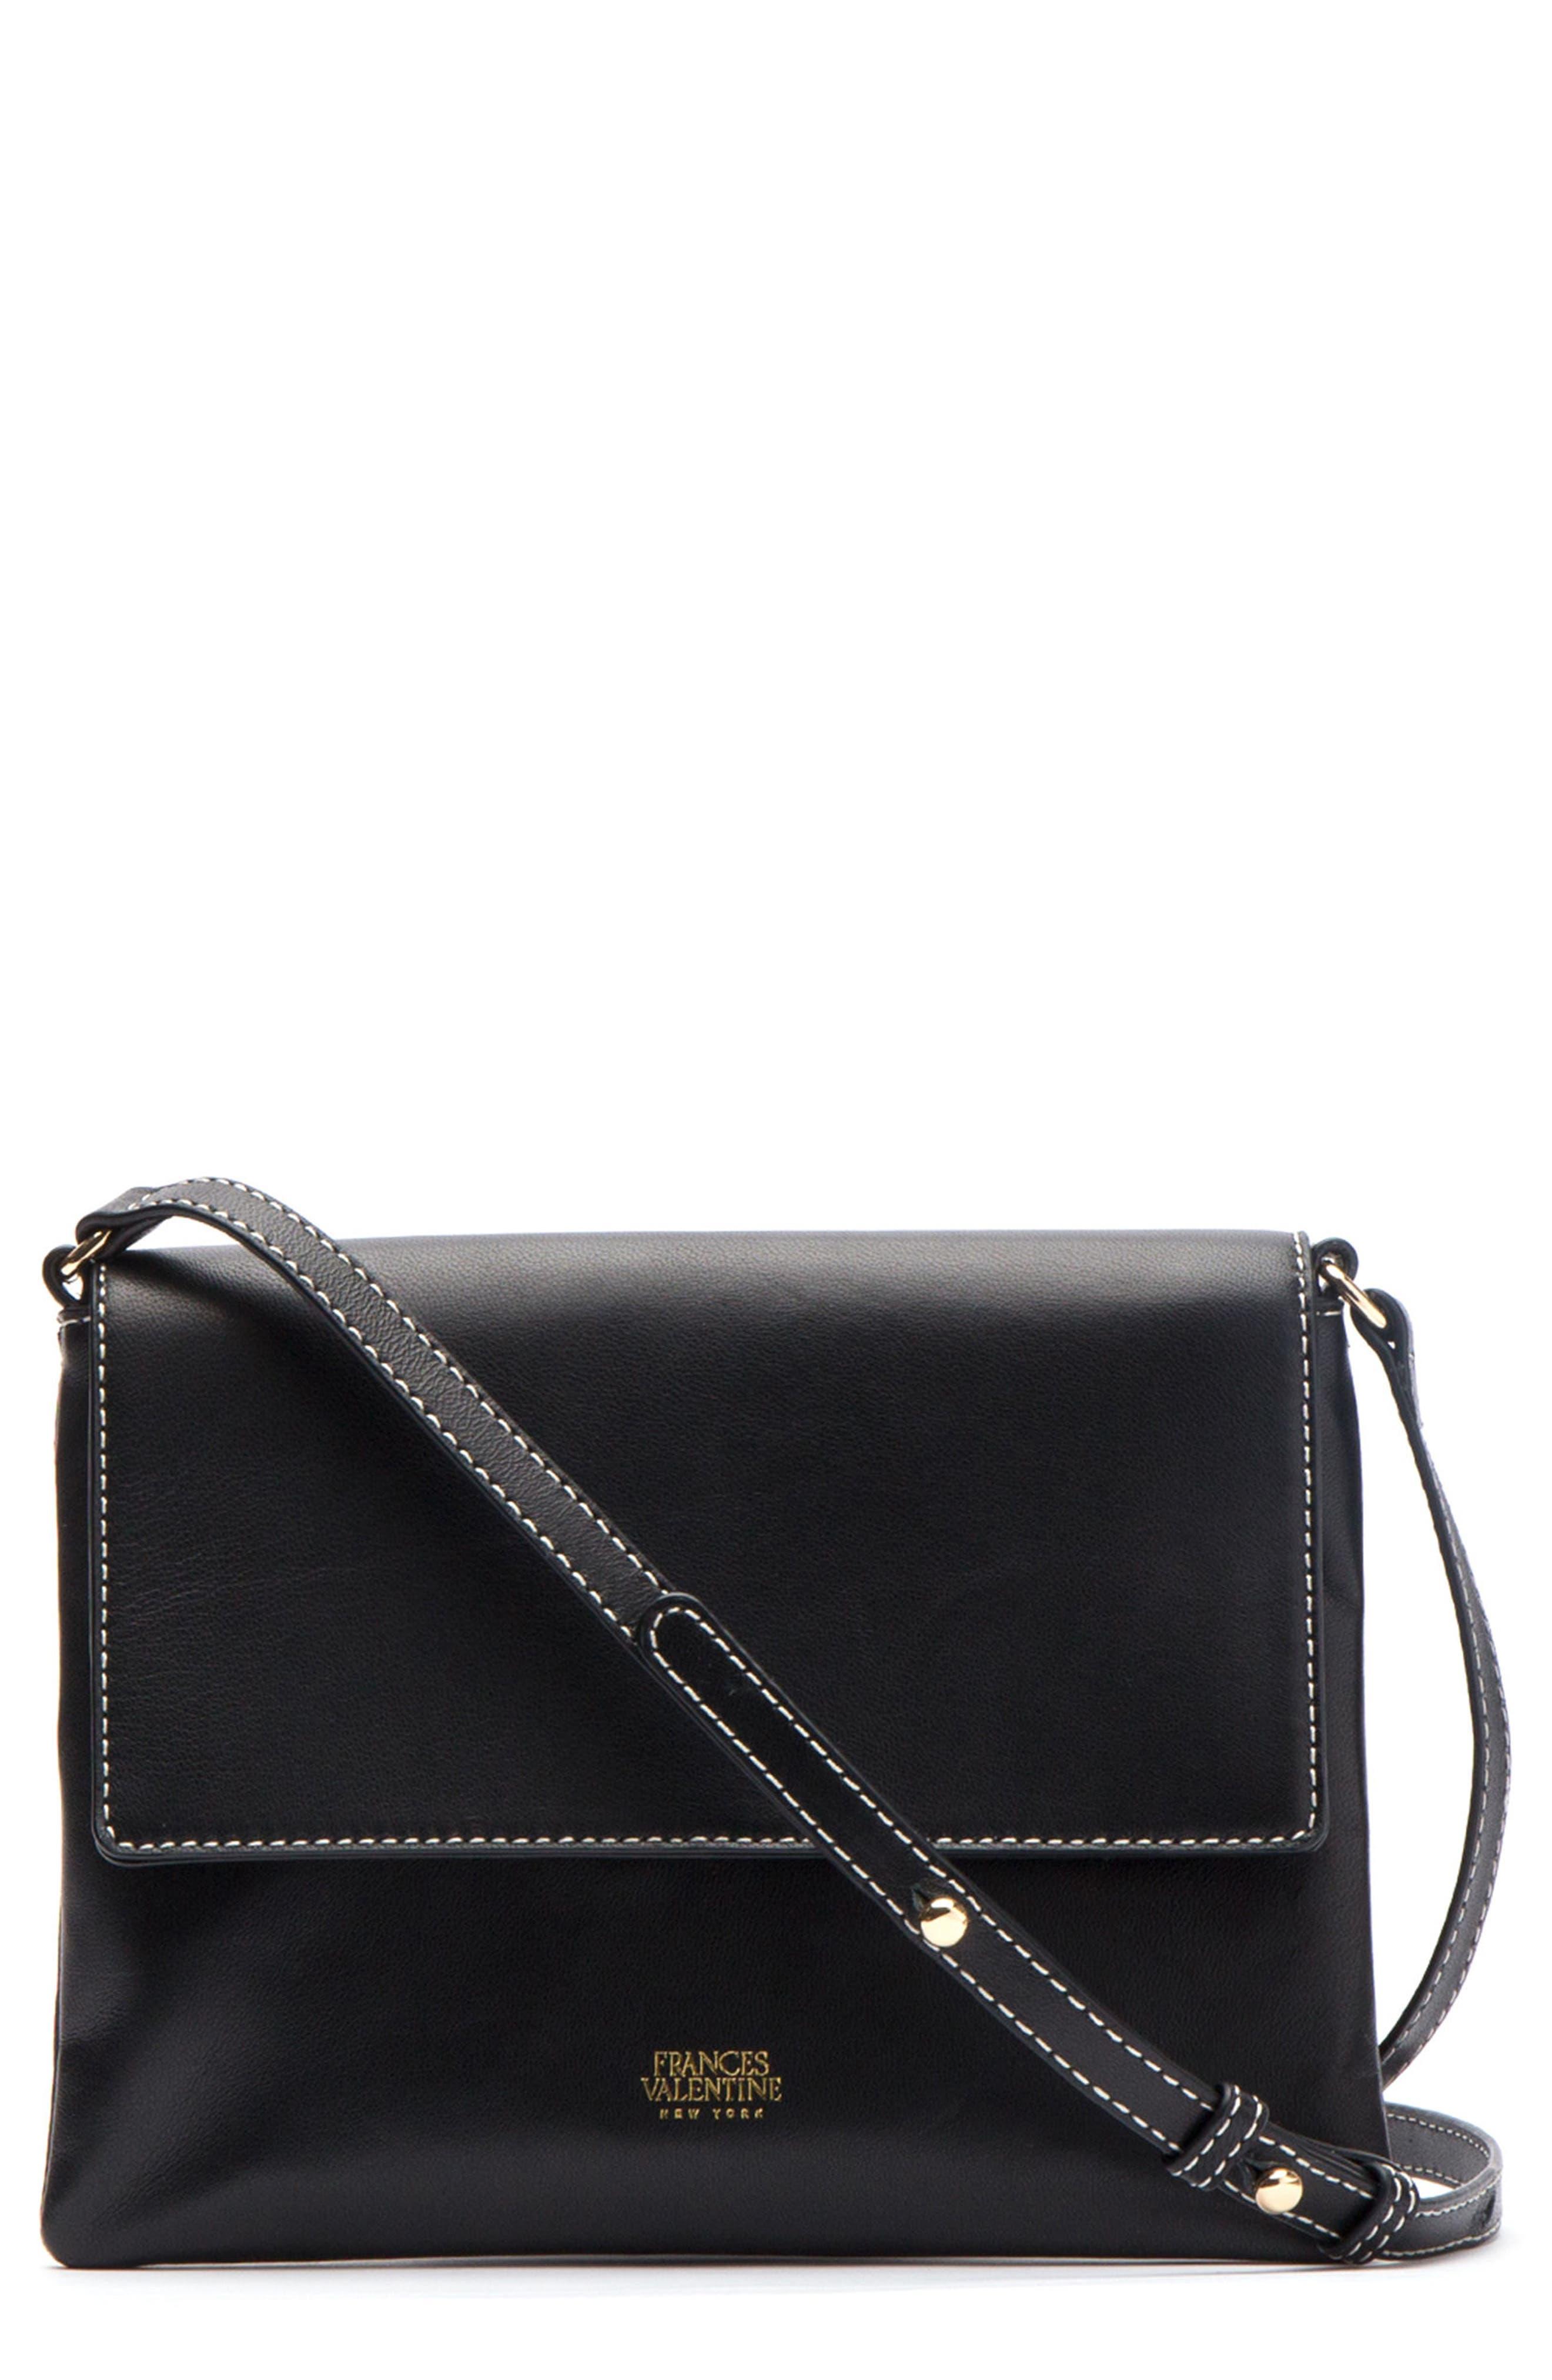 Main Image - Frances Valentine Maggie Leather Crossbody Bag